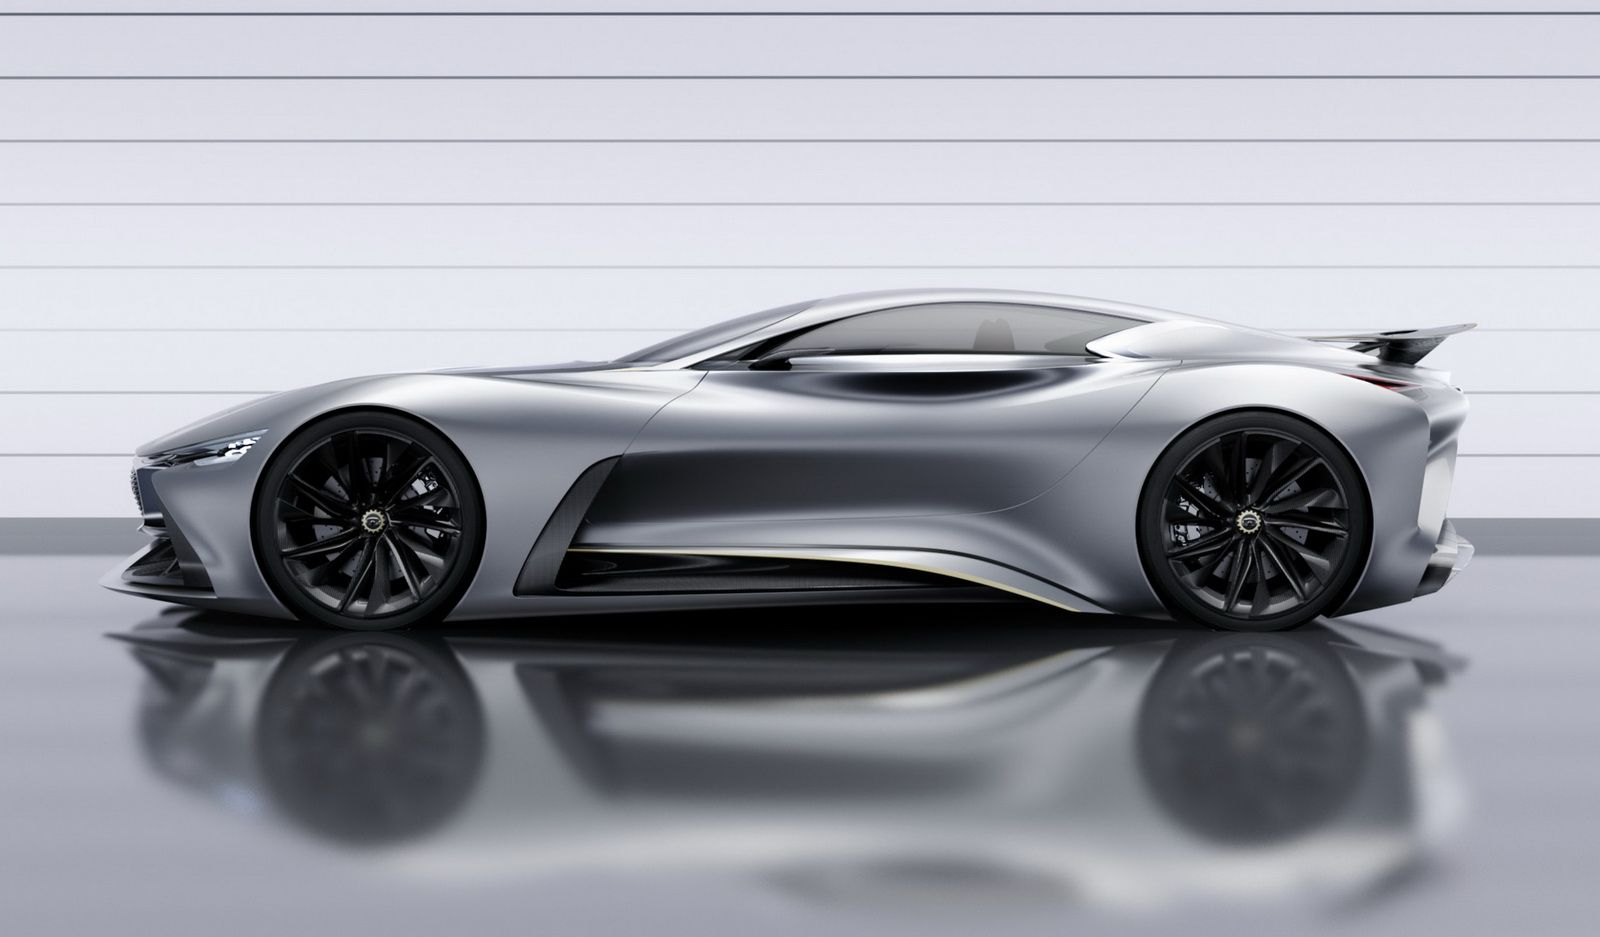 Infiniti S Concept Vision Gran Turismo May Preview A Future